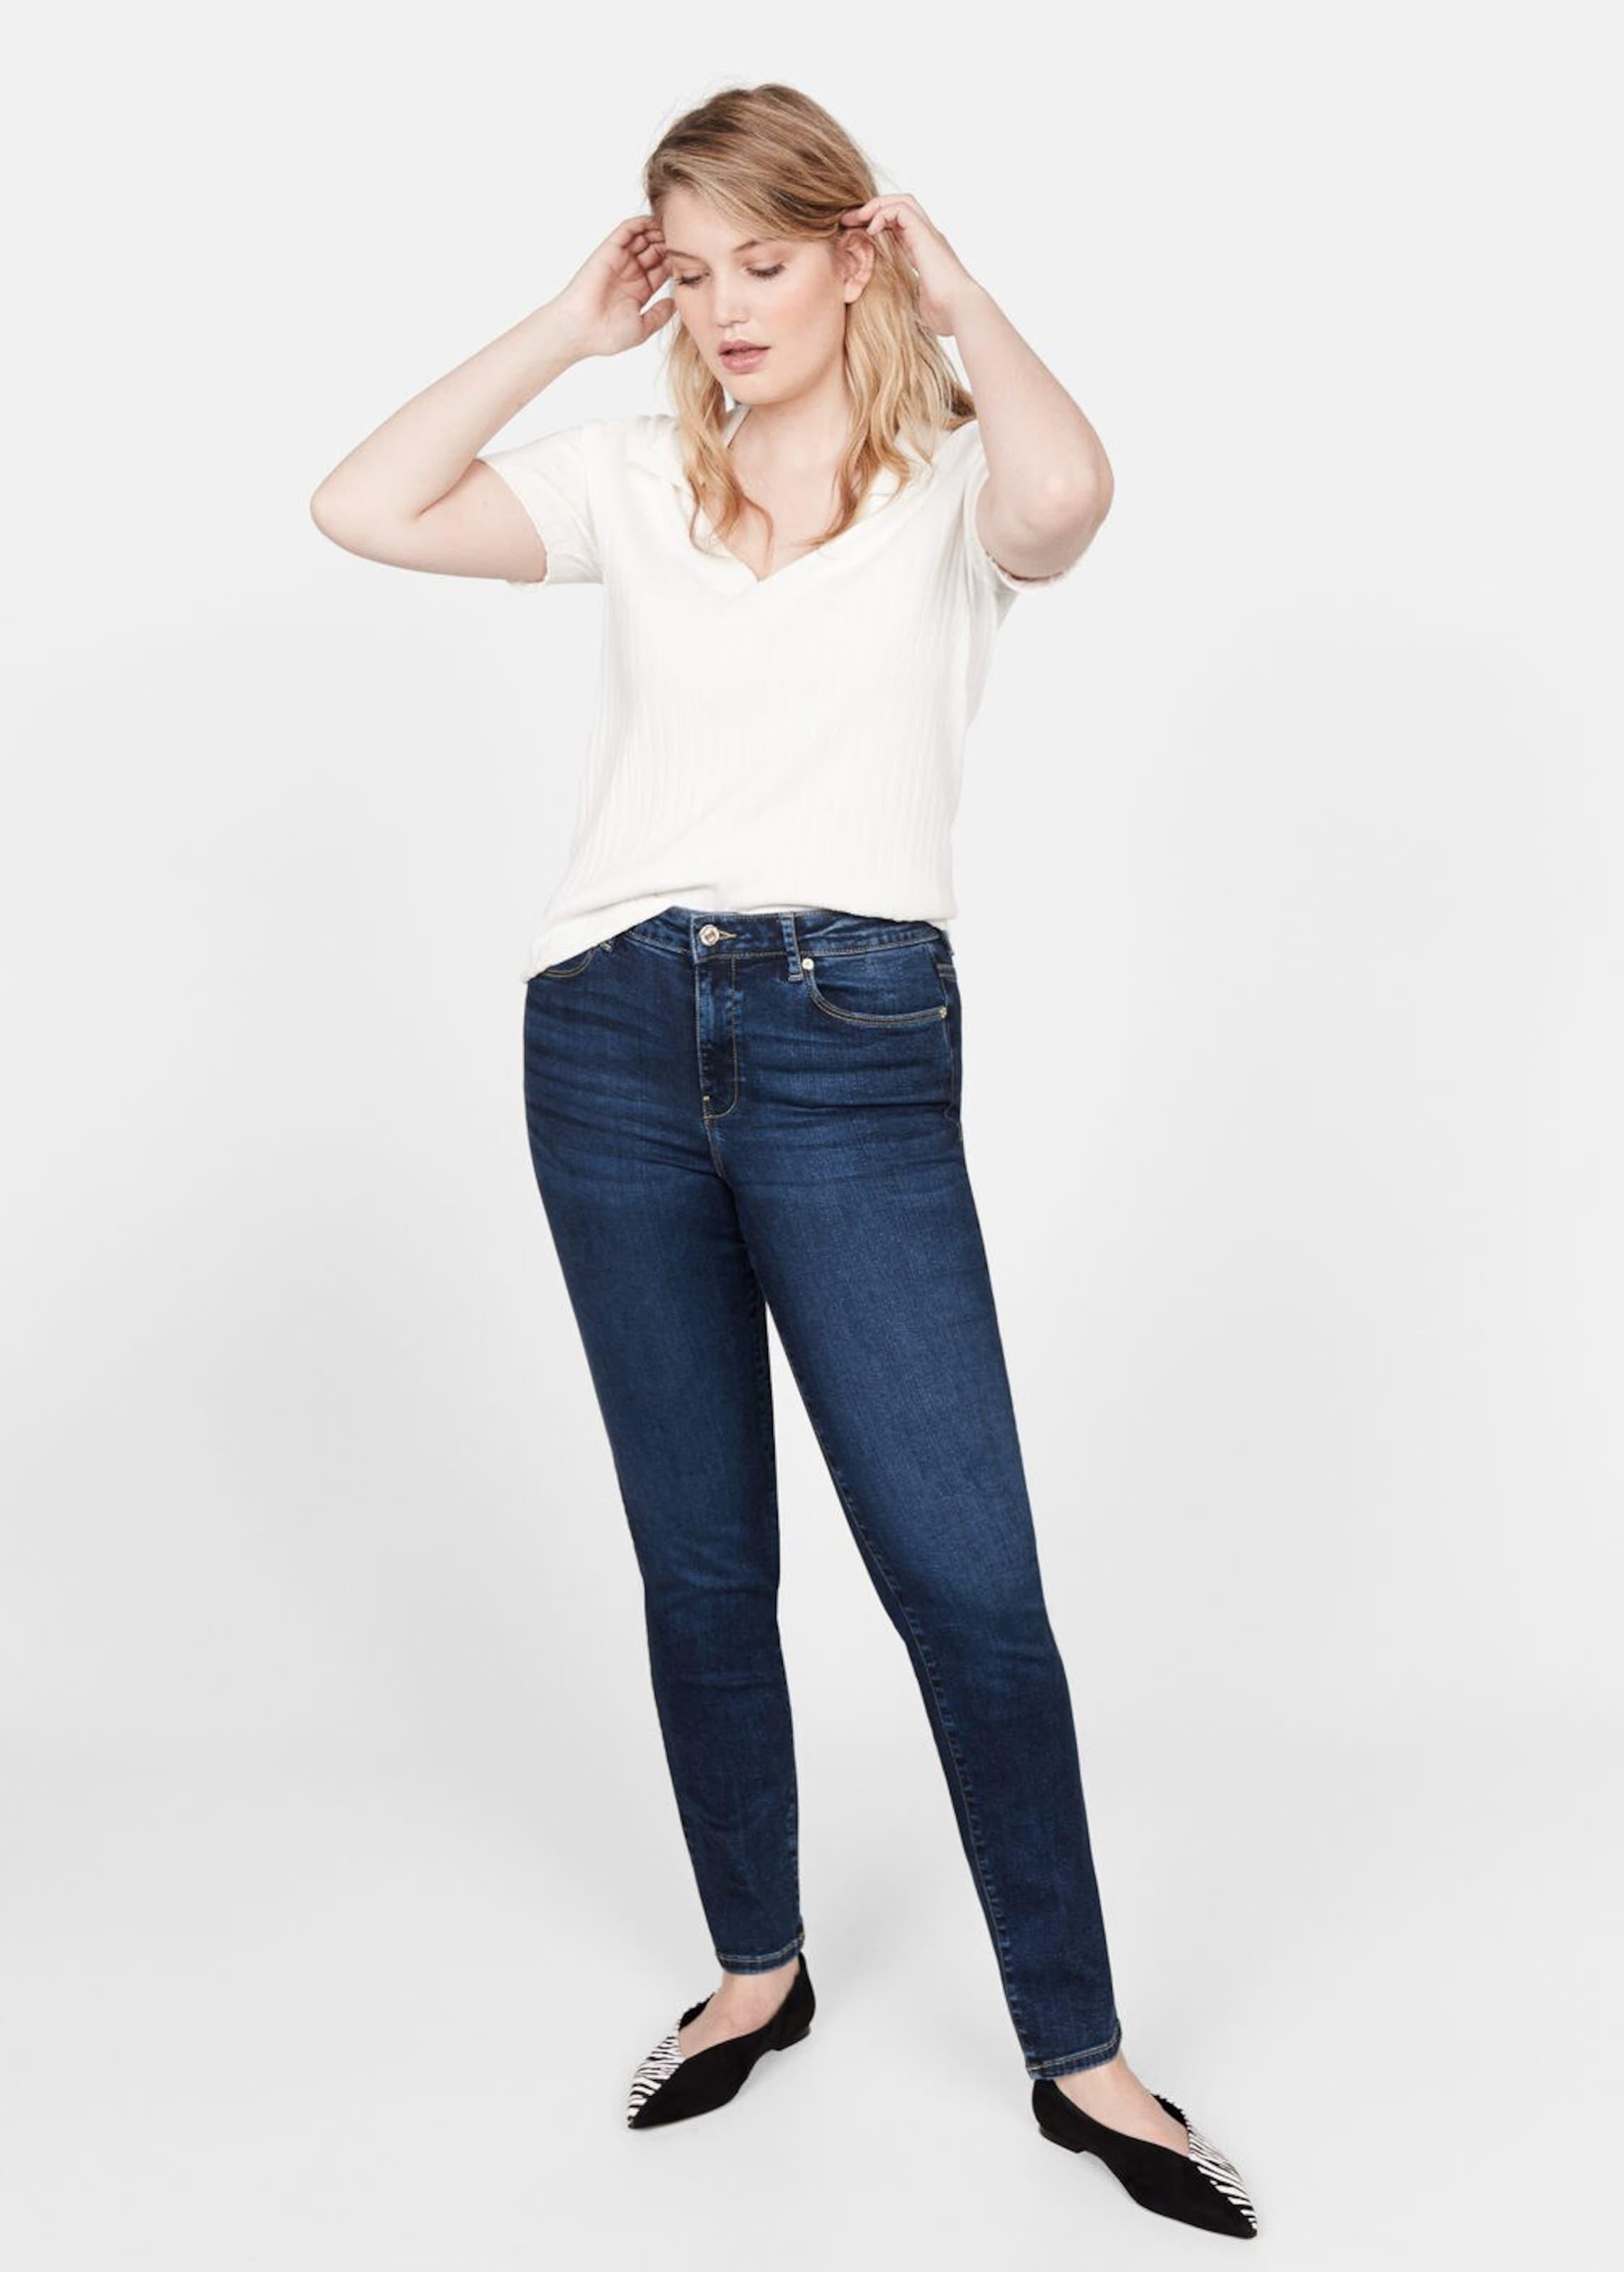 By Mango Dunkelblau Violeta Jeans In 'valentin' N80Onwvm